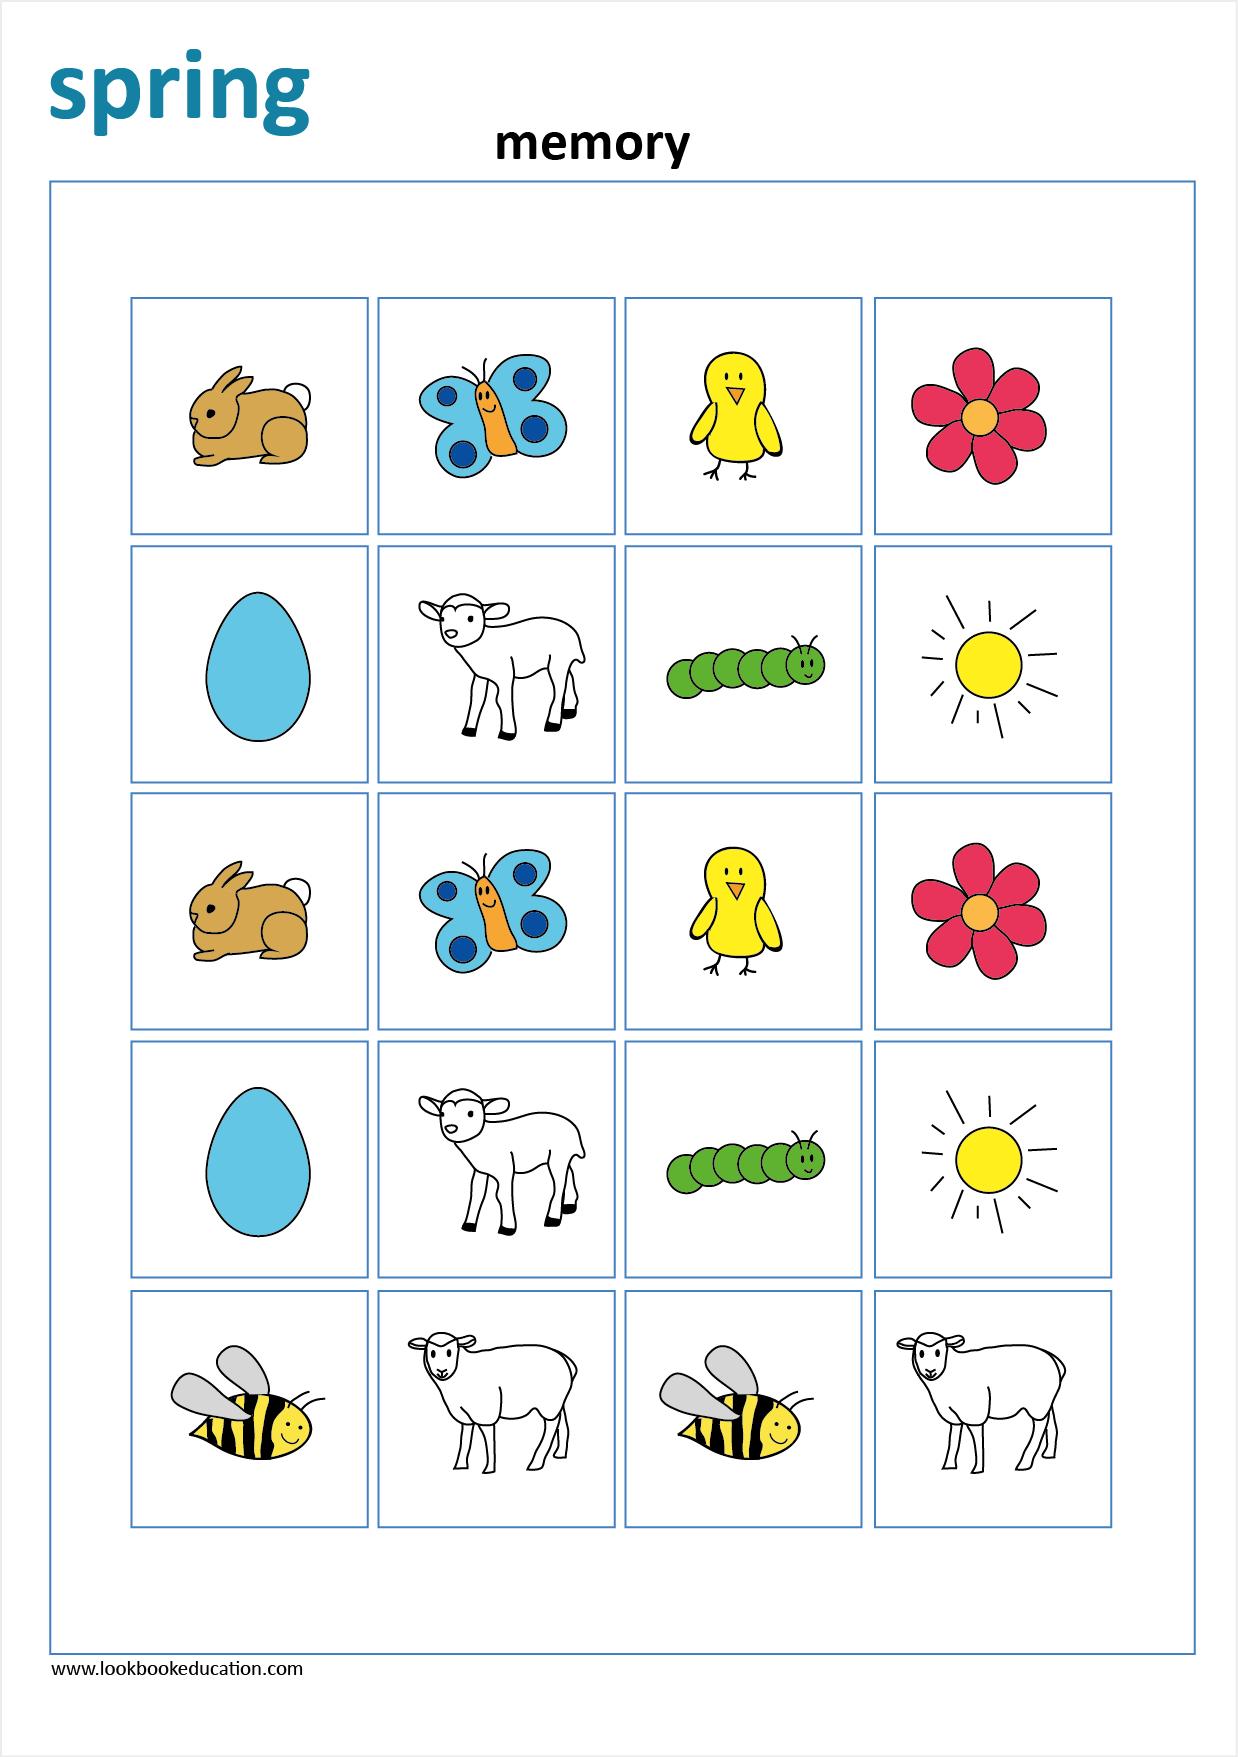 hight resolution of Worksheet Spring Memory - Lookbook Education